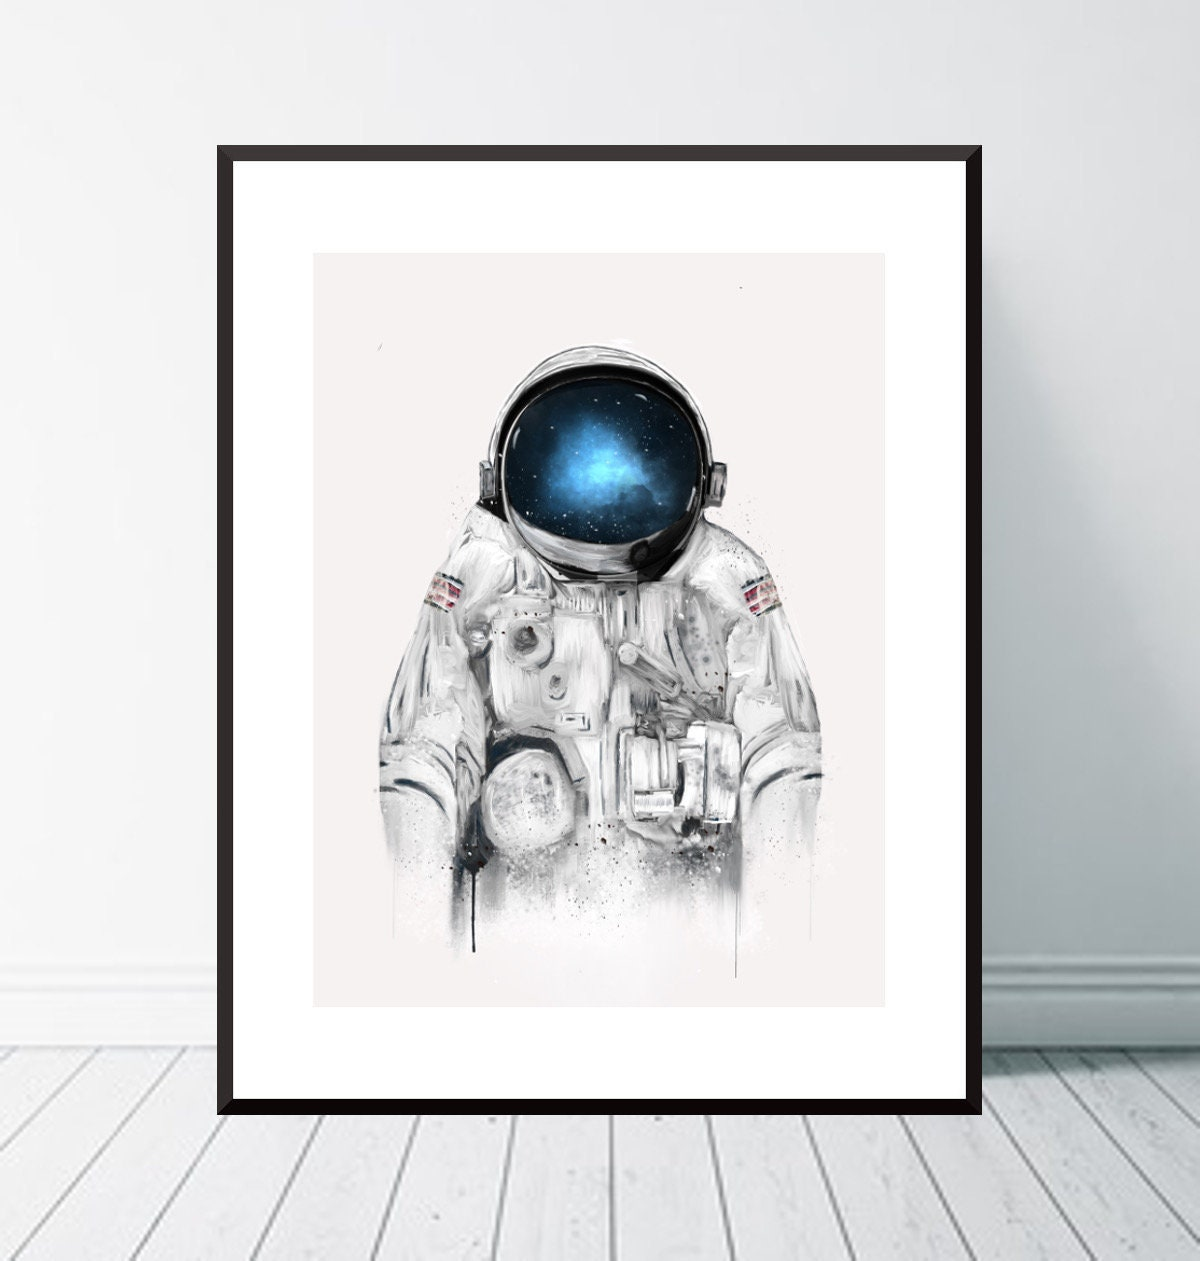 retro astronaut posters - HD1200×1261